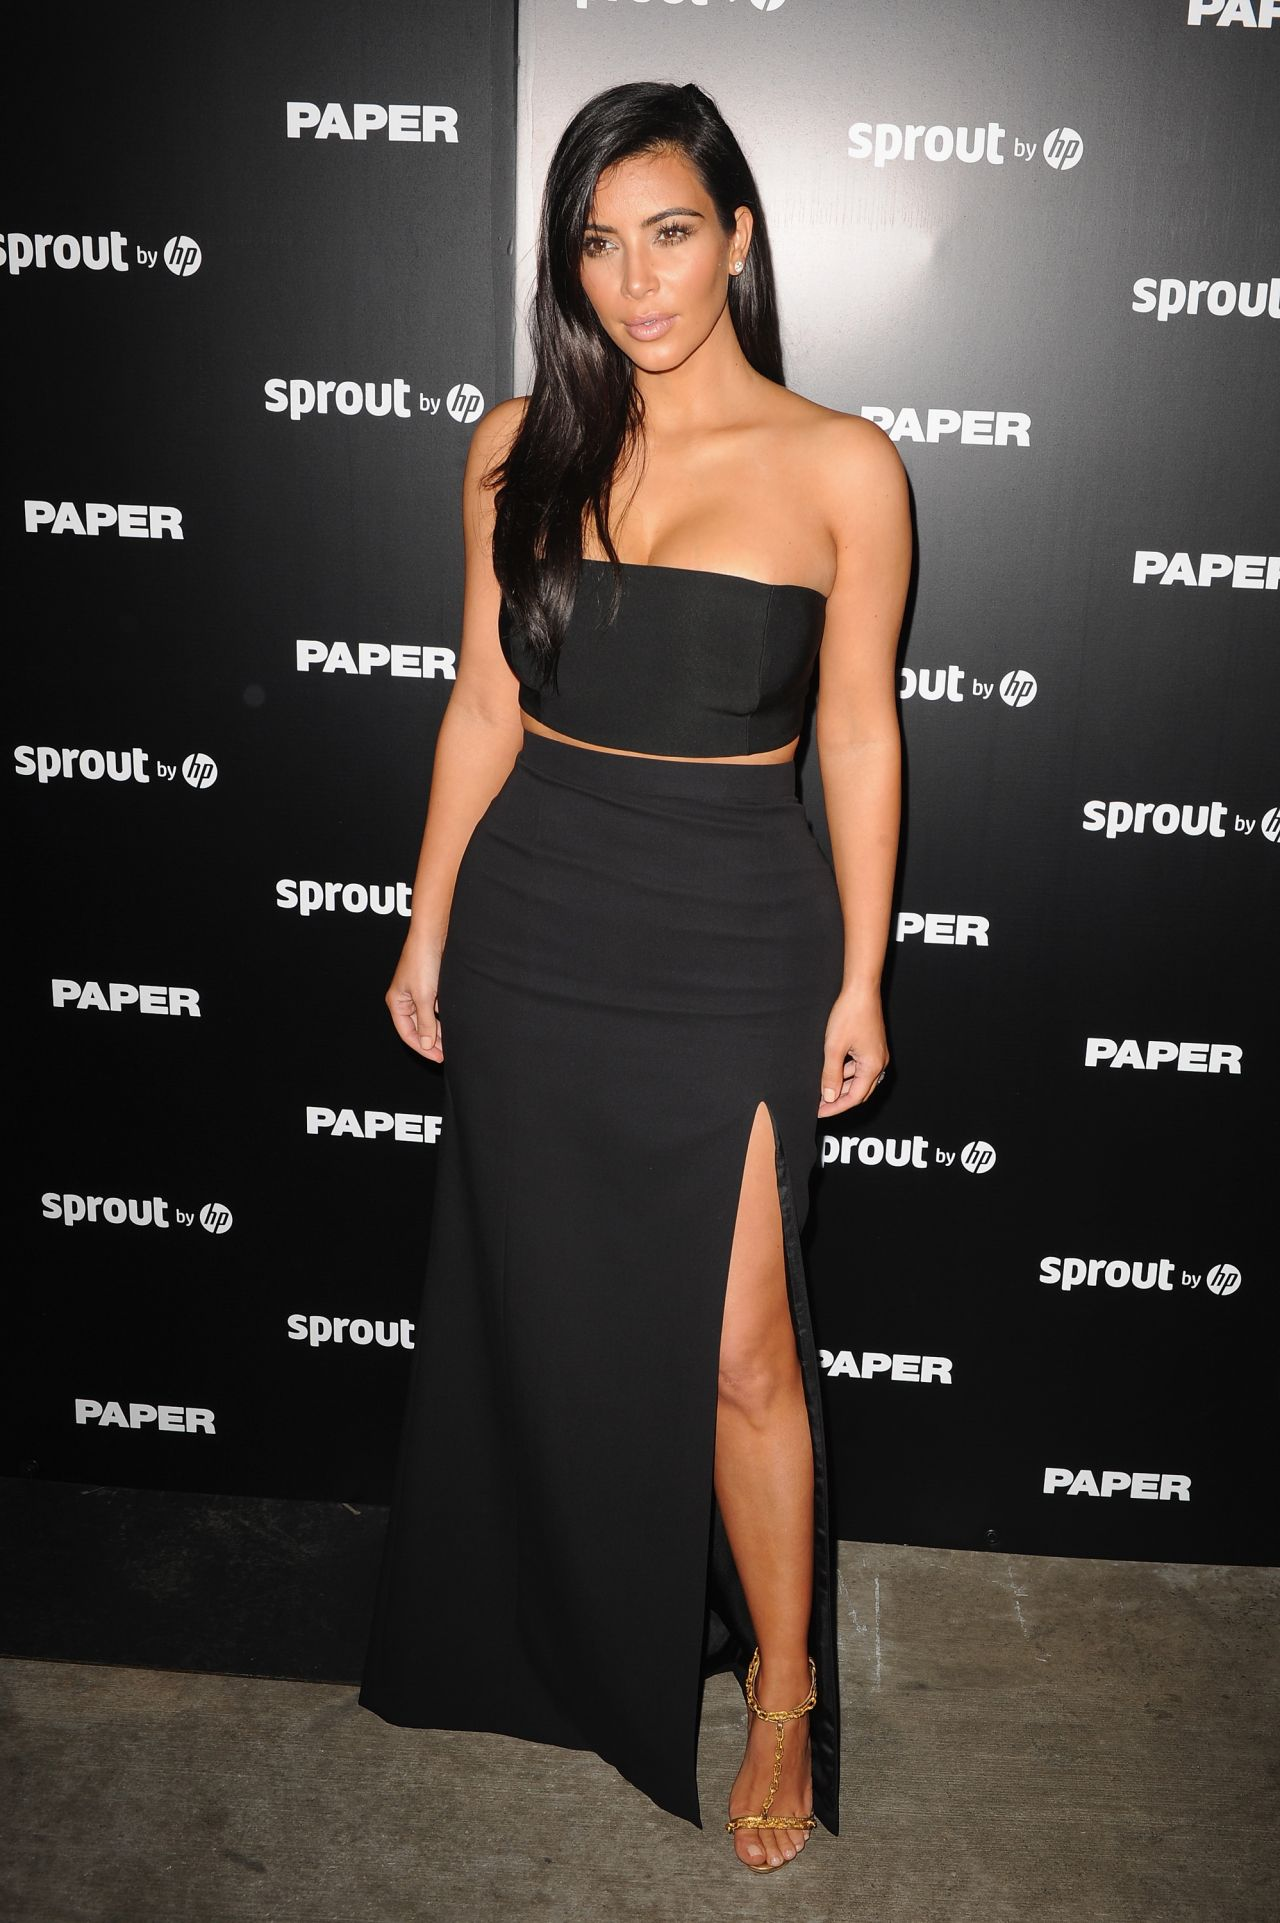 kim-kardashian-paper-magazine-break-the-internet-issue-release-in-miami_11